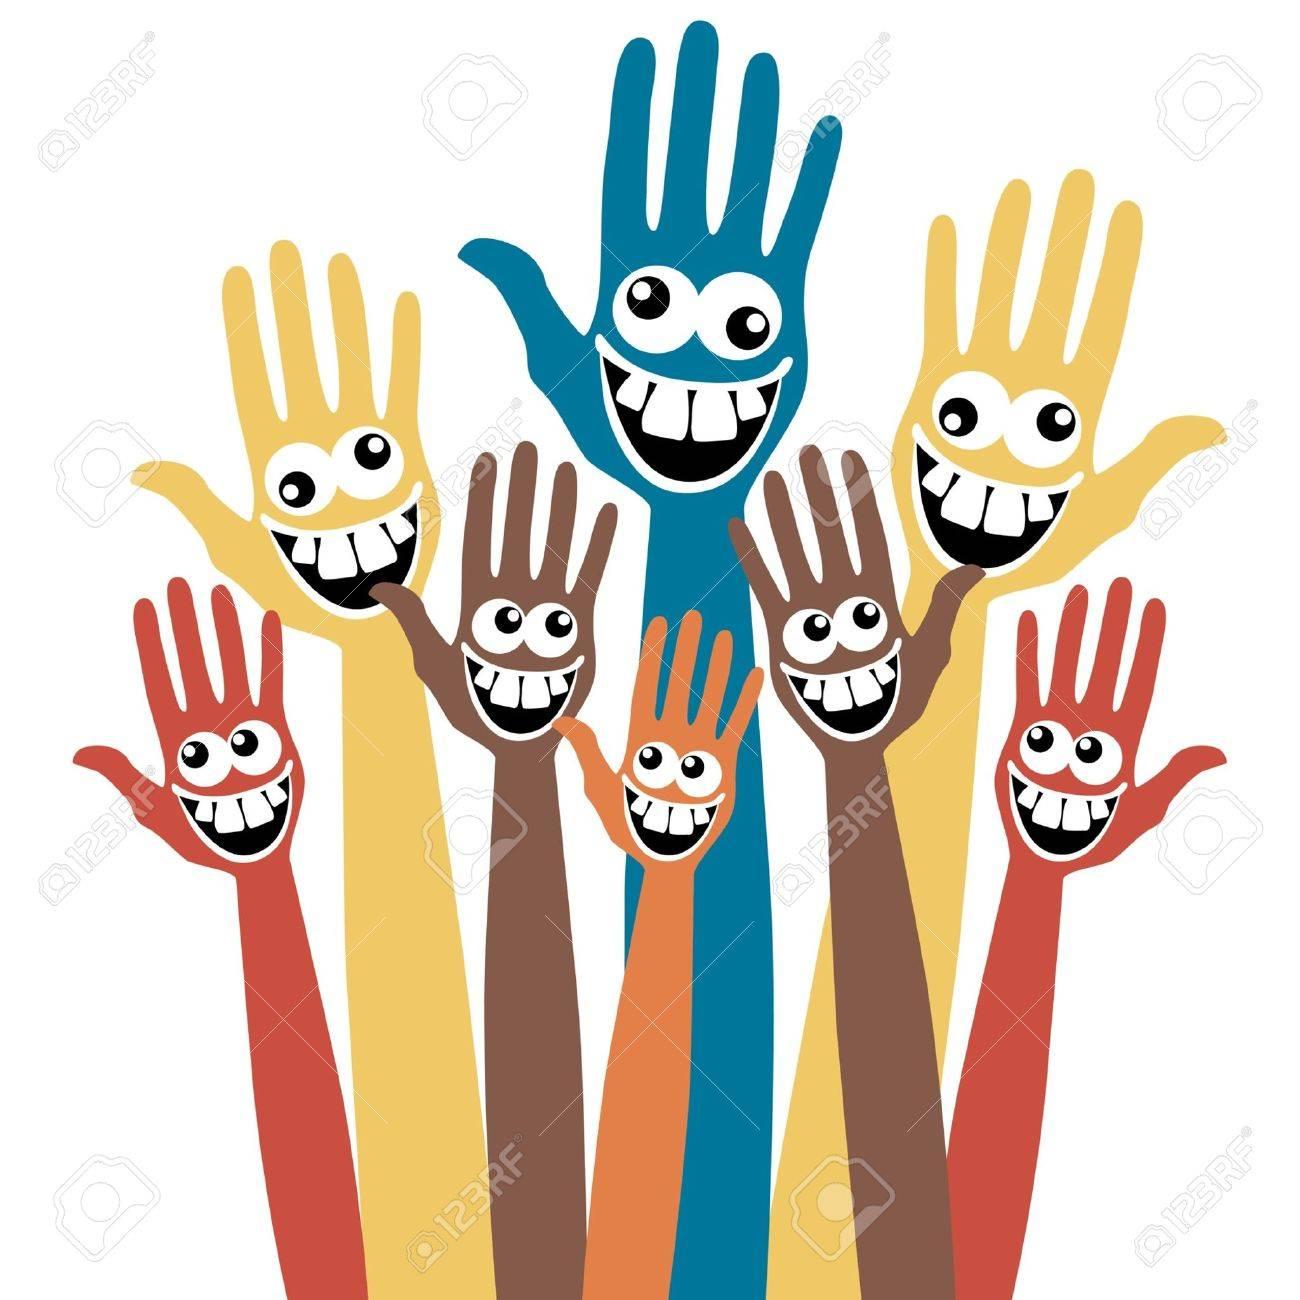 Crazy face hands. - 10043859